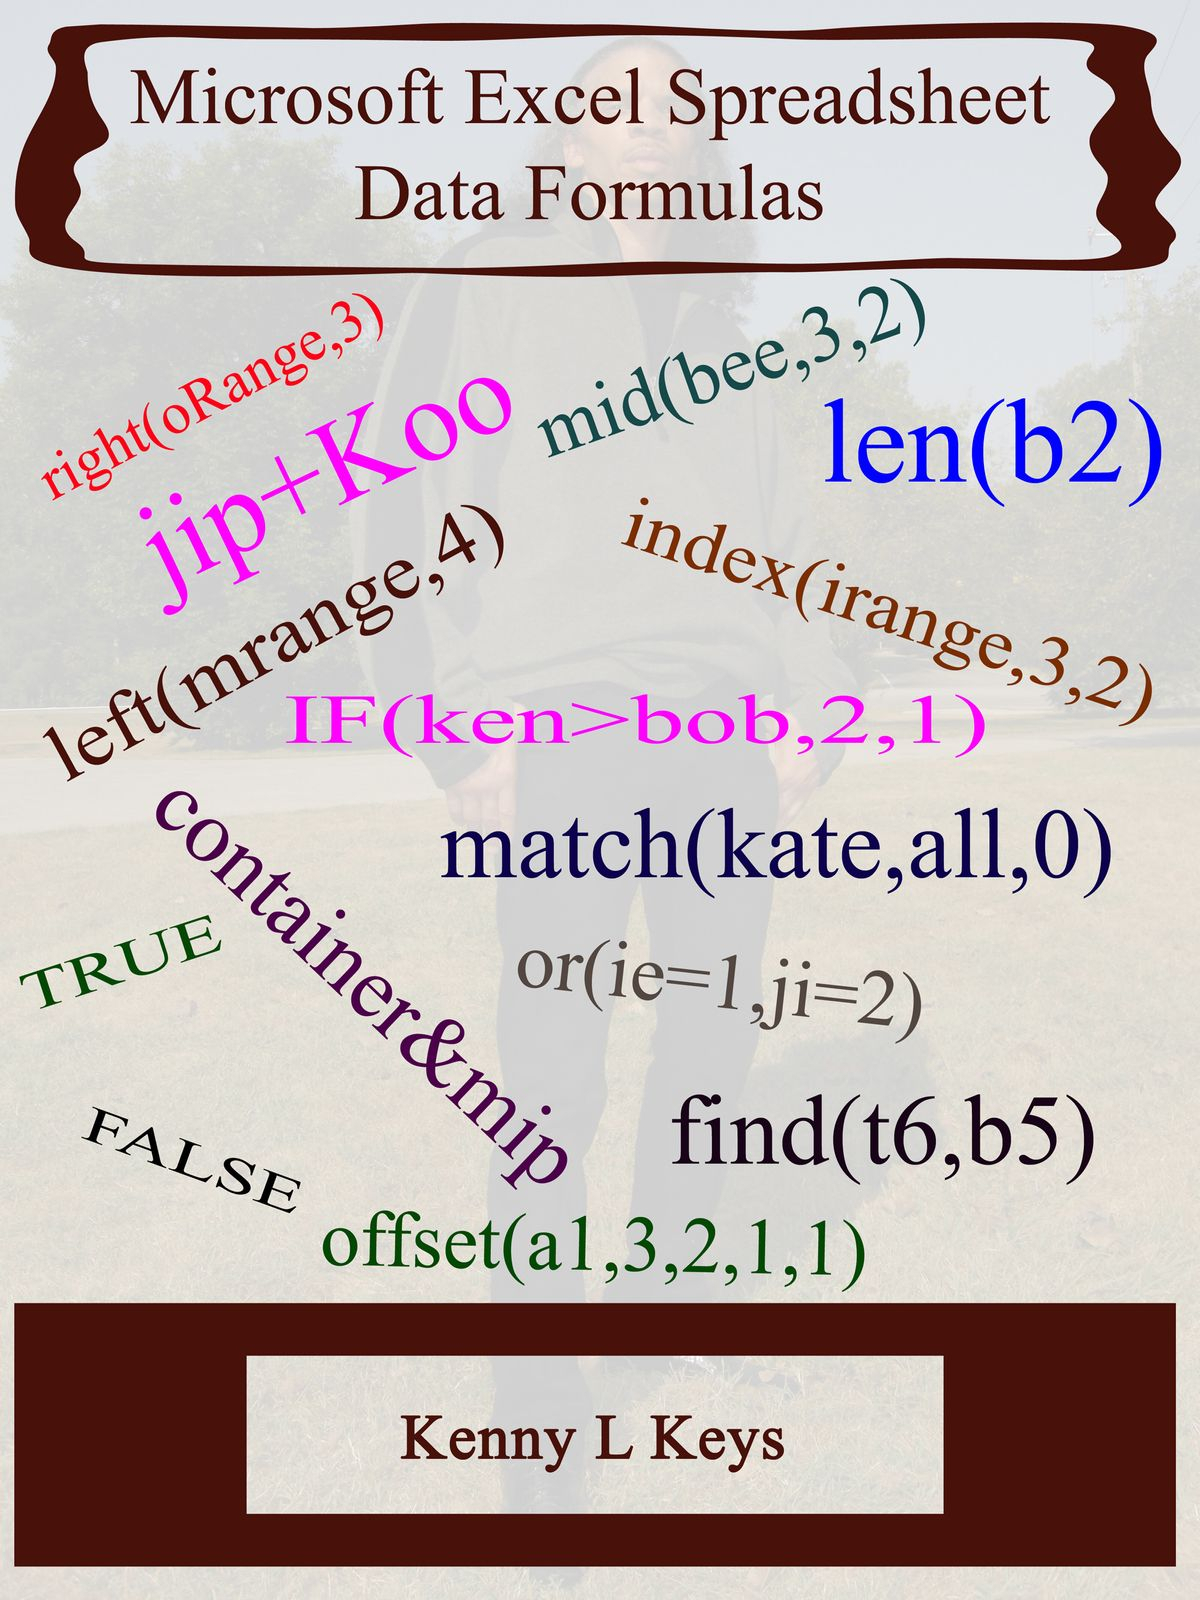 Spreadsheet Formulas Inside Microsoft Excel Spreadsheet Data Formulas Ebookkenny L Keys